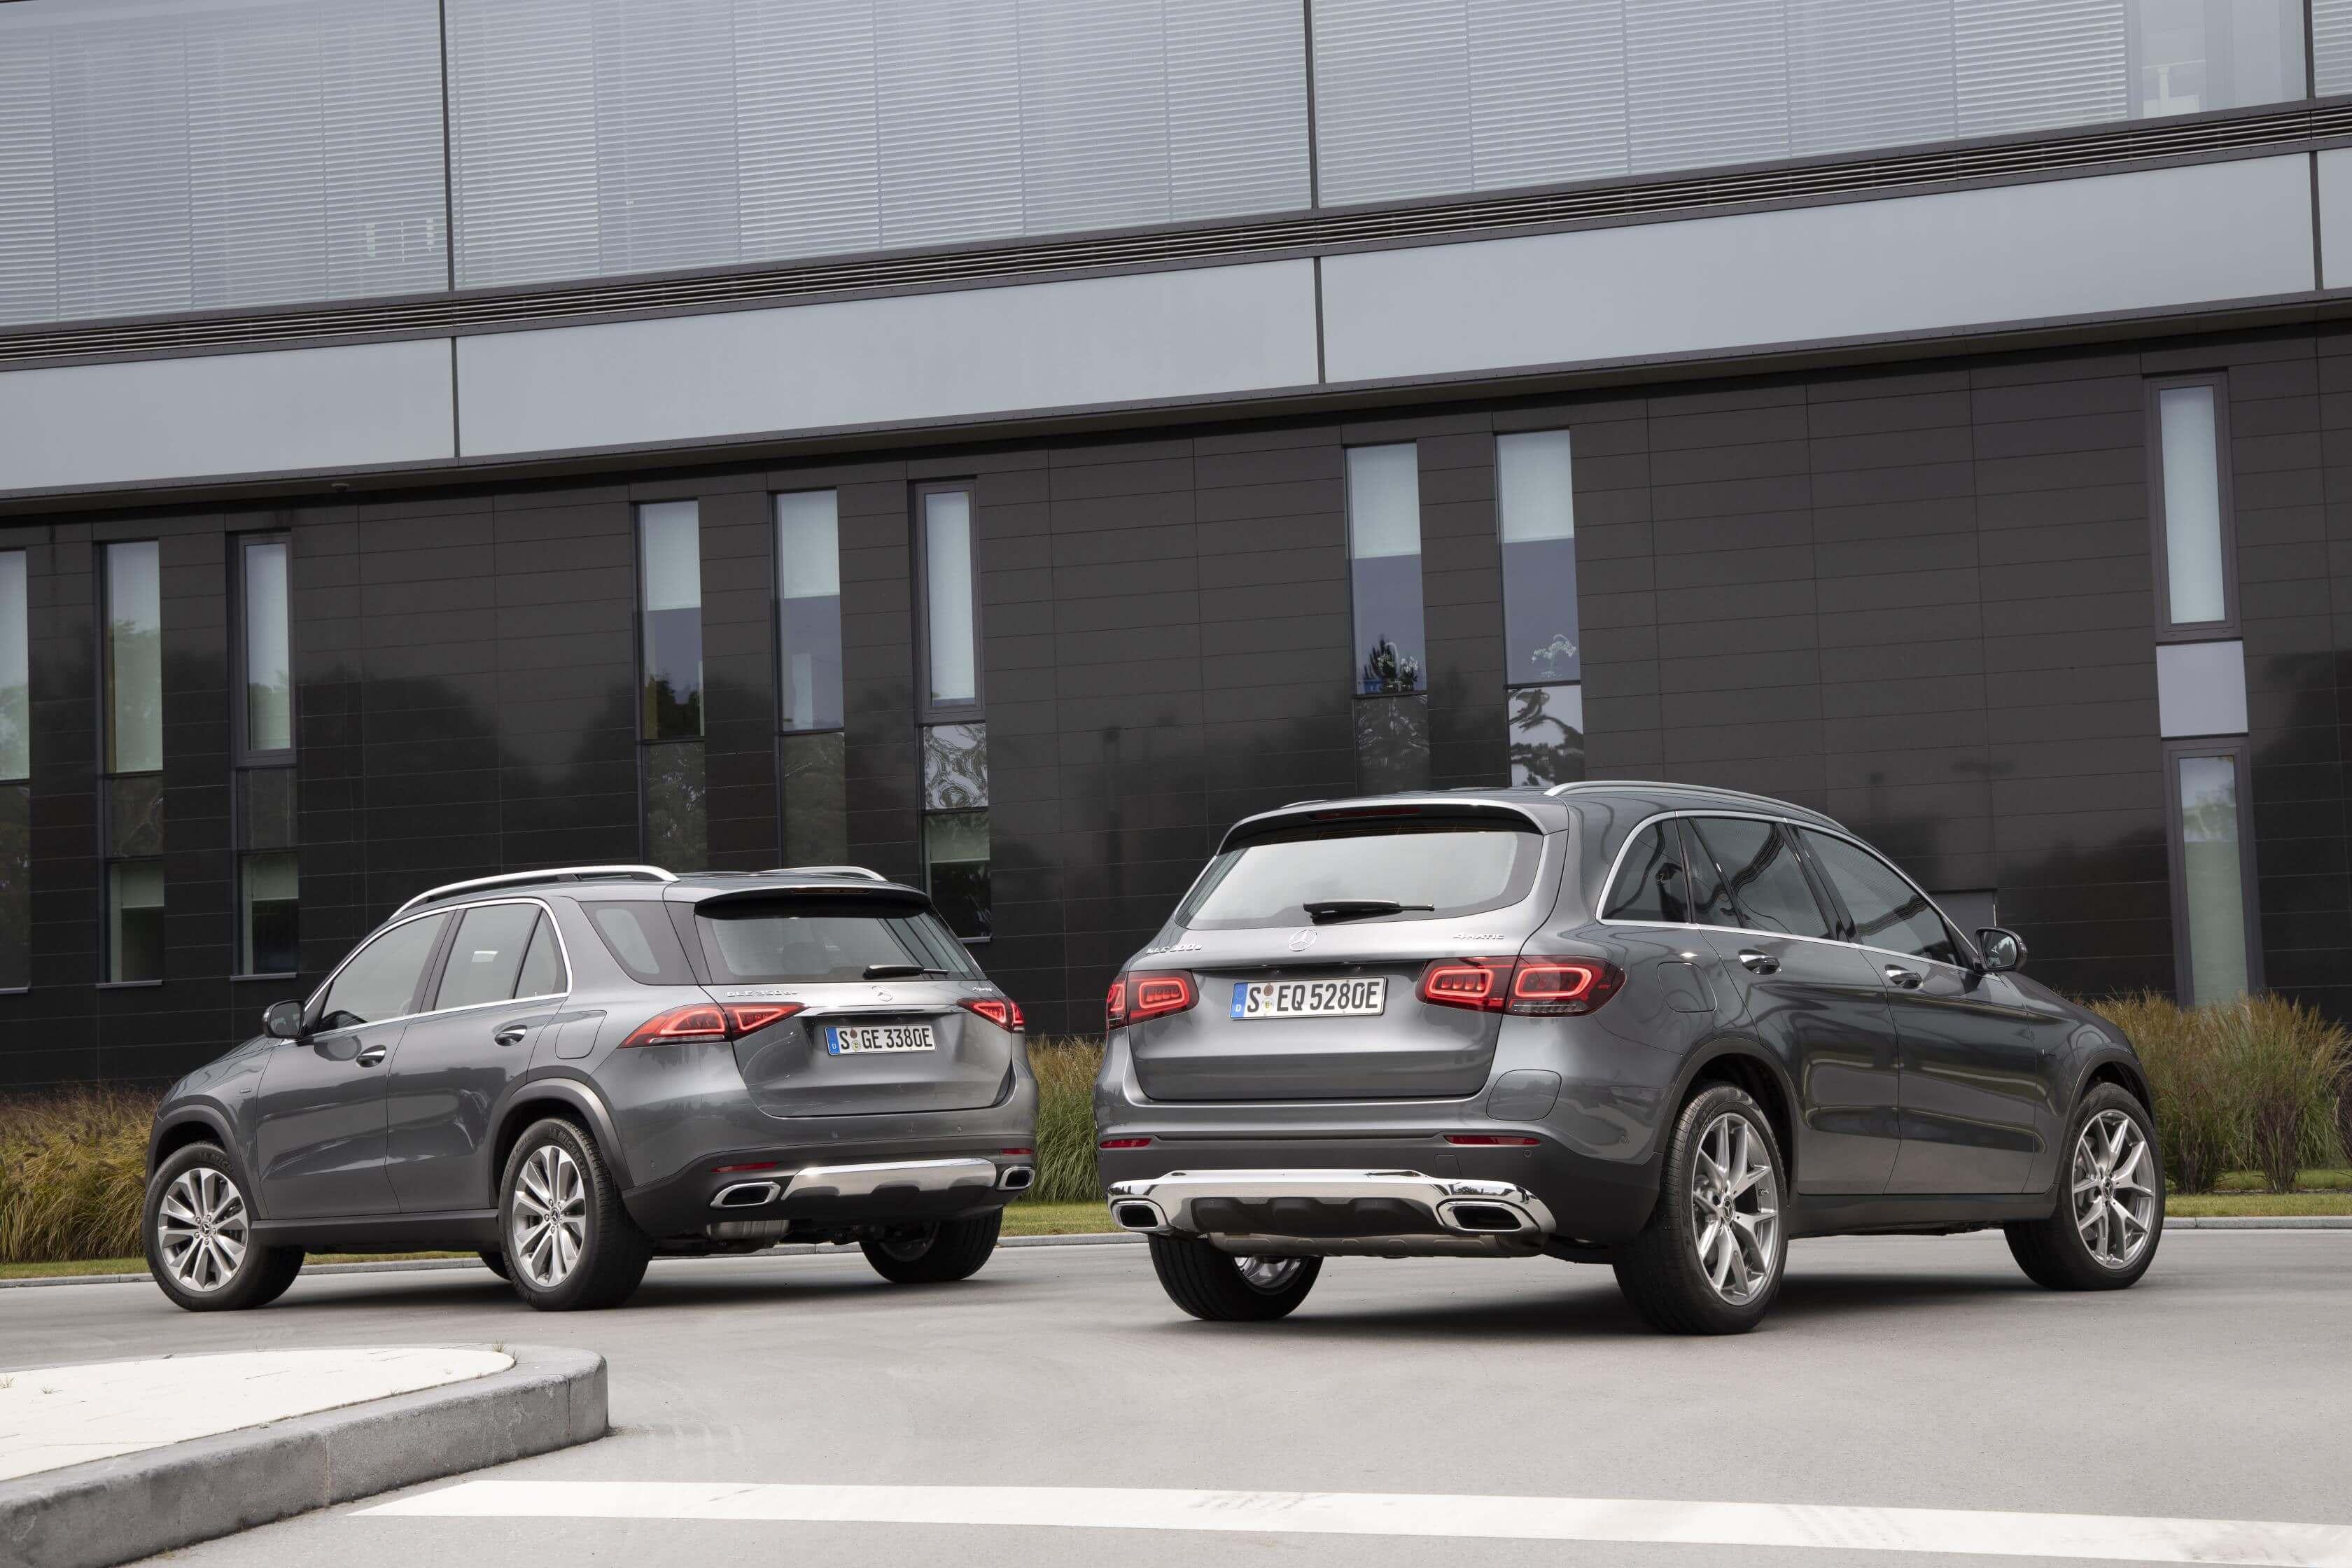 Trasera de los Mercedes GLE 350 de 4MATIC y GLC 300 e 4MATIC